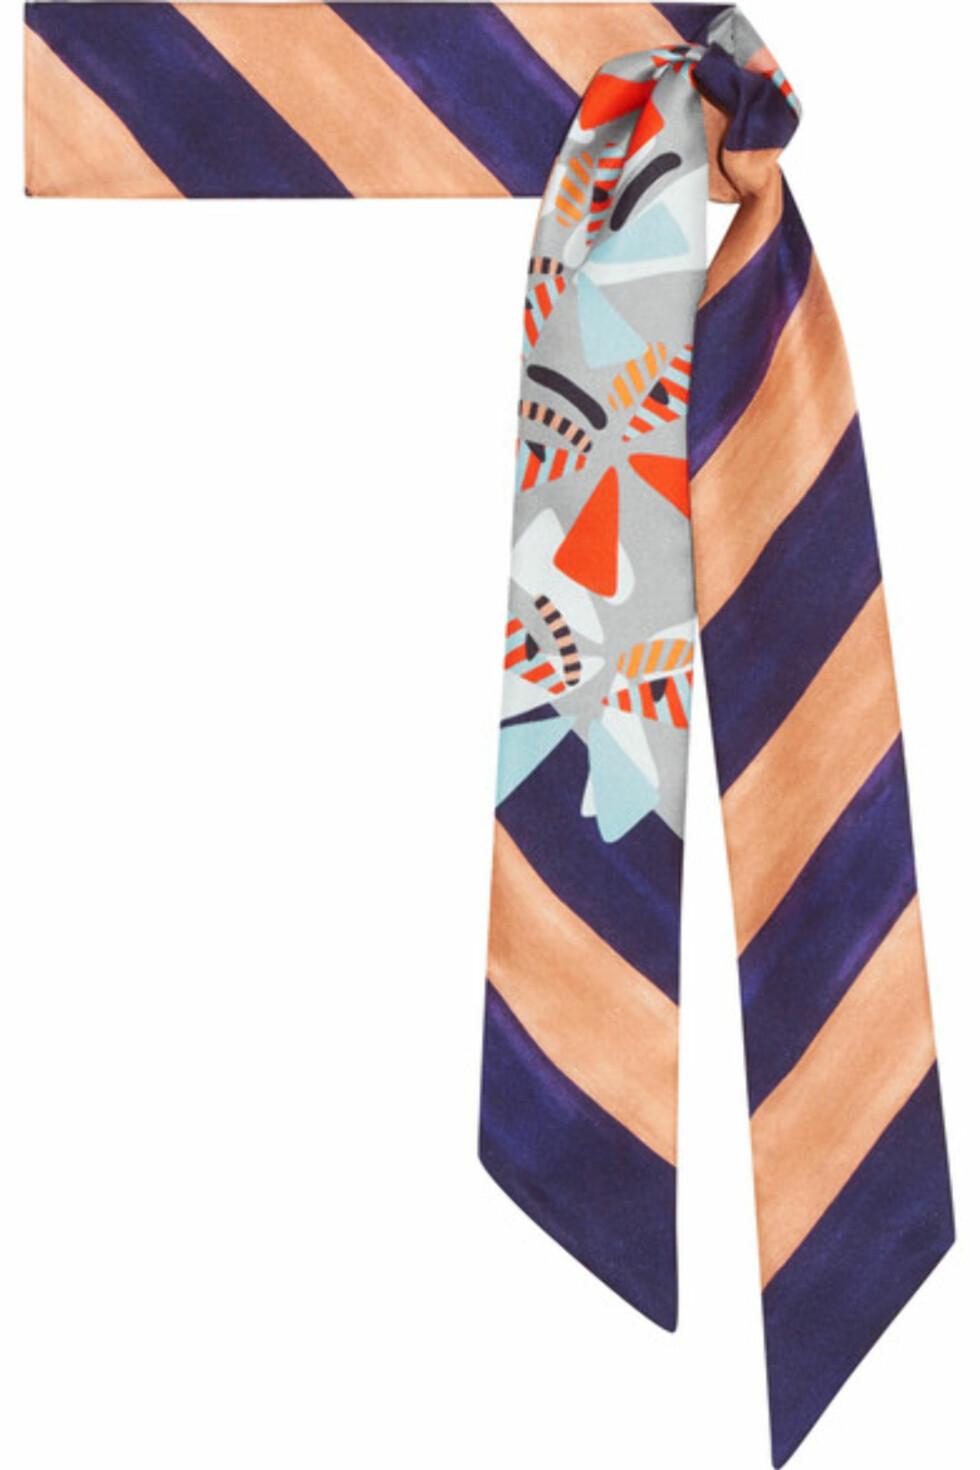 Silkeskjerf fra Fendi via Net-a-porter.com  1500,-  https://www.net-a-porter.com/no/en/product/894340/fendi/printed-silk-twill-scarf